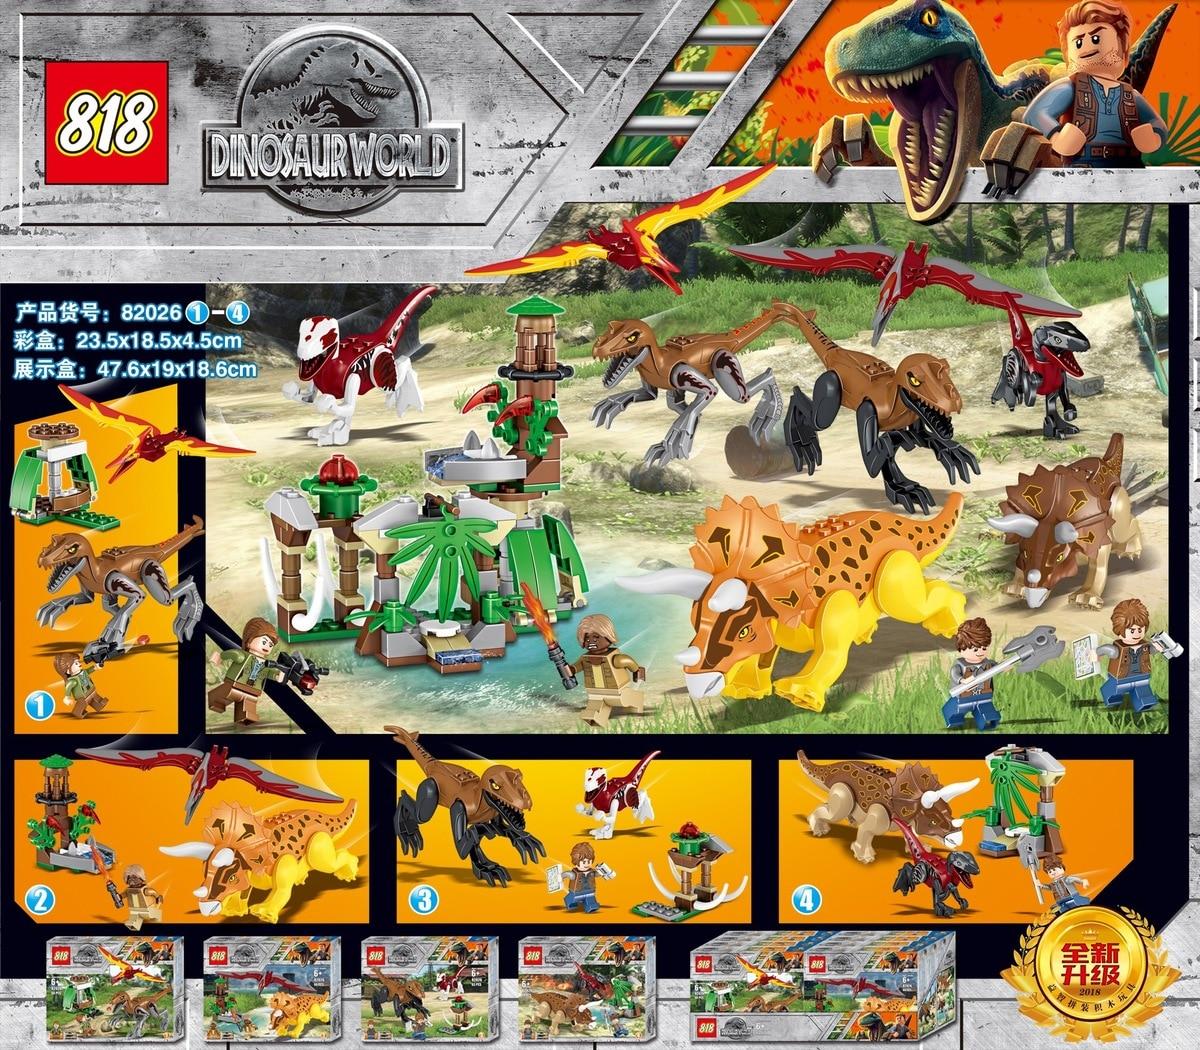 82026 Tyrannosaurus Triceratops Pterosaurs Dinosaur  Building Block Bricks Toys For Kid Suitable   Jurassic World Gift